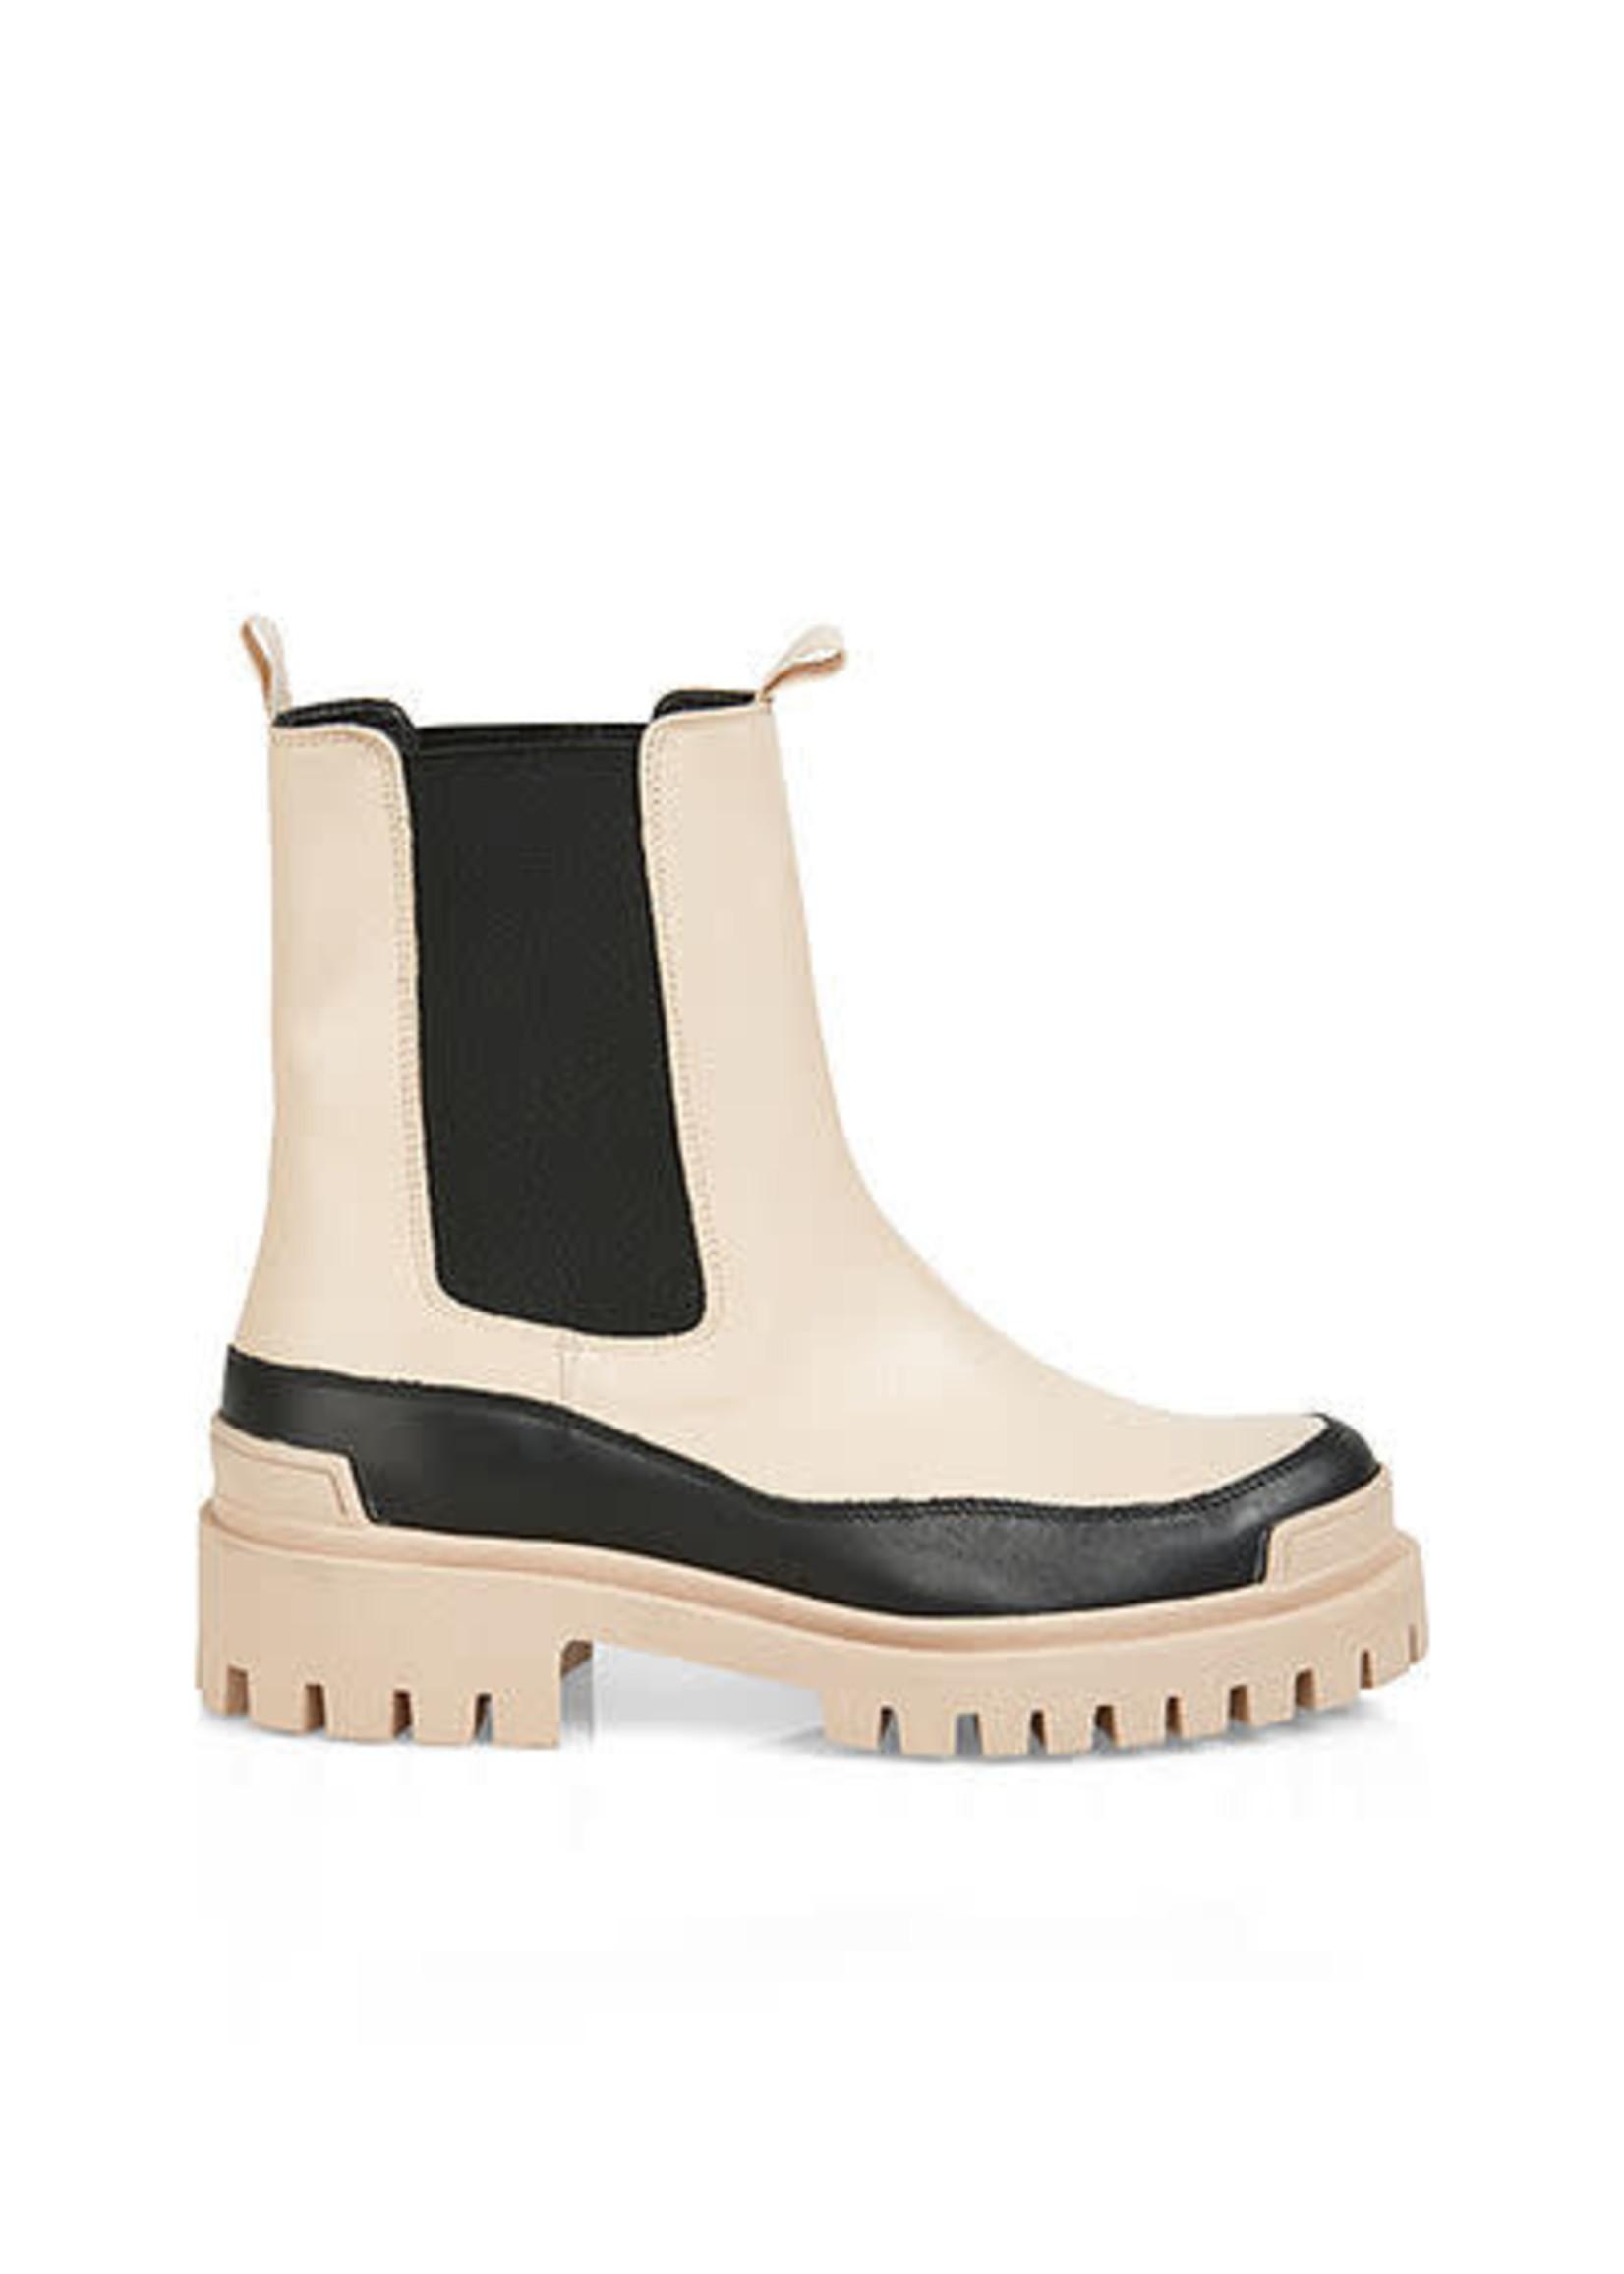 Marccain Bags & Shoes Enkel Laars RB SB.21 L13 blush